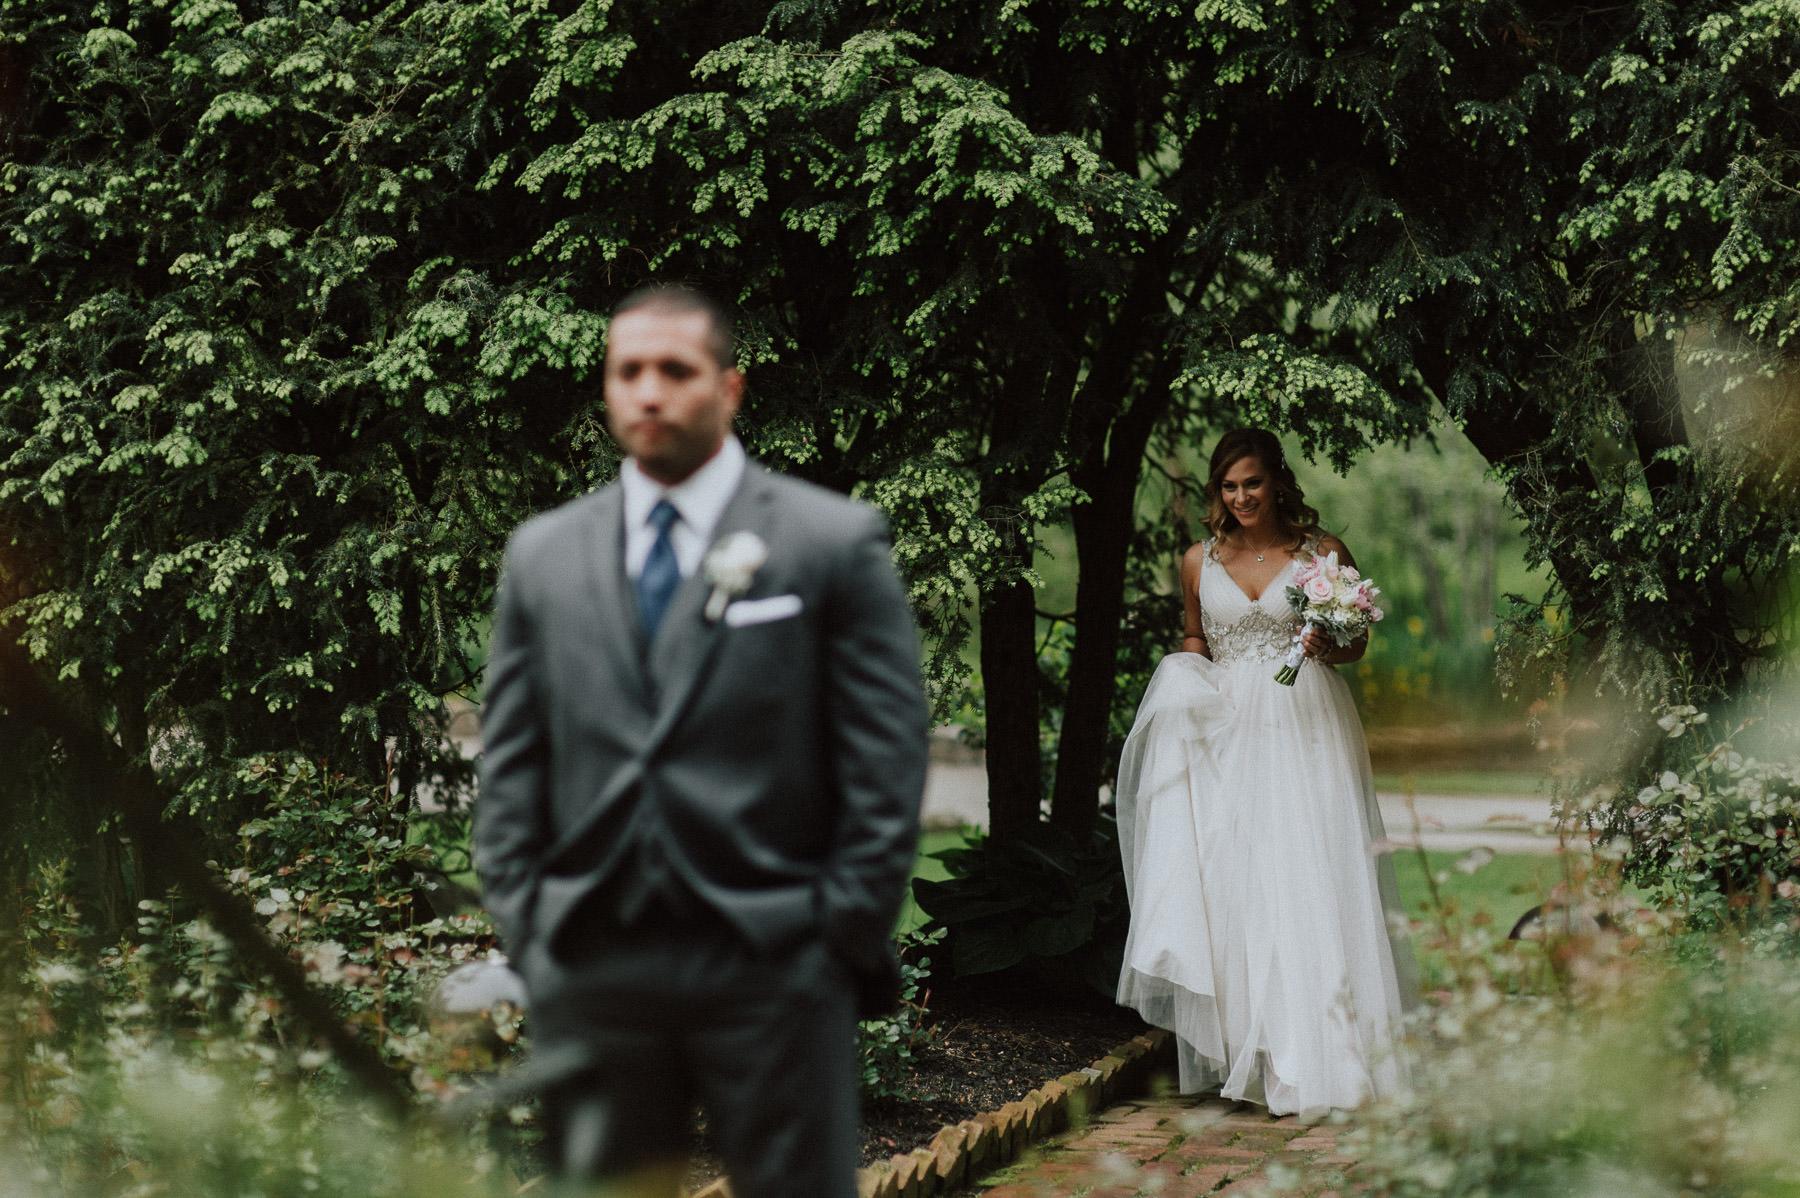 appleford-estate-wedding-photography-27.jpg